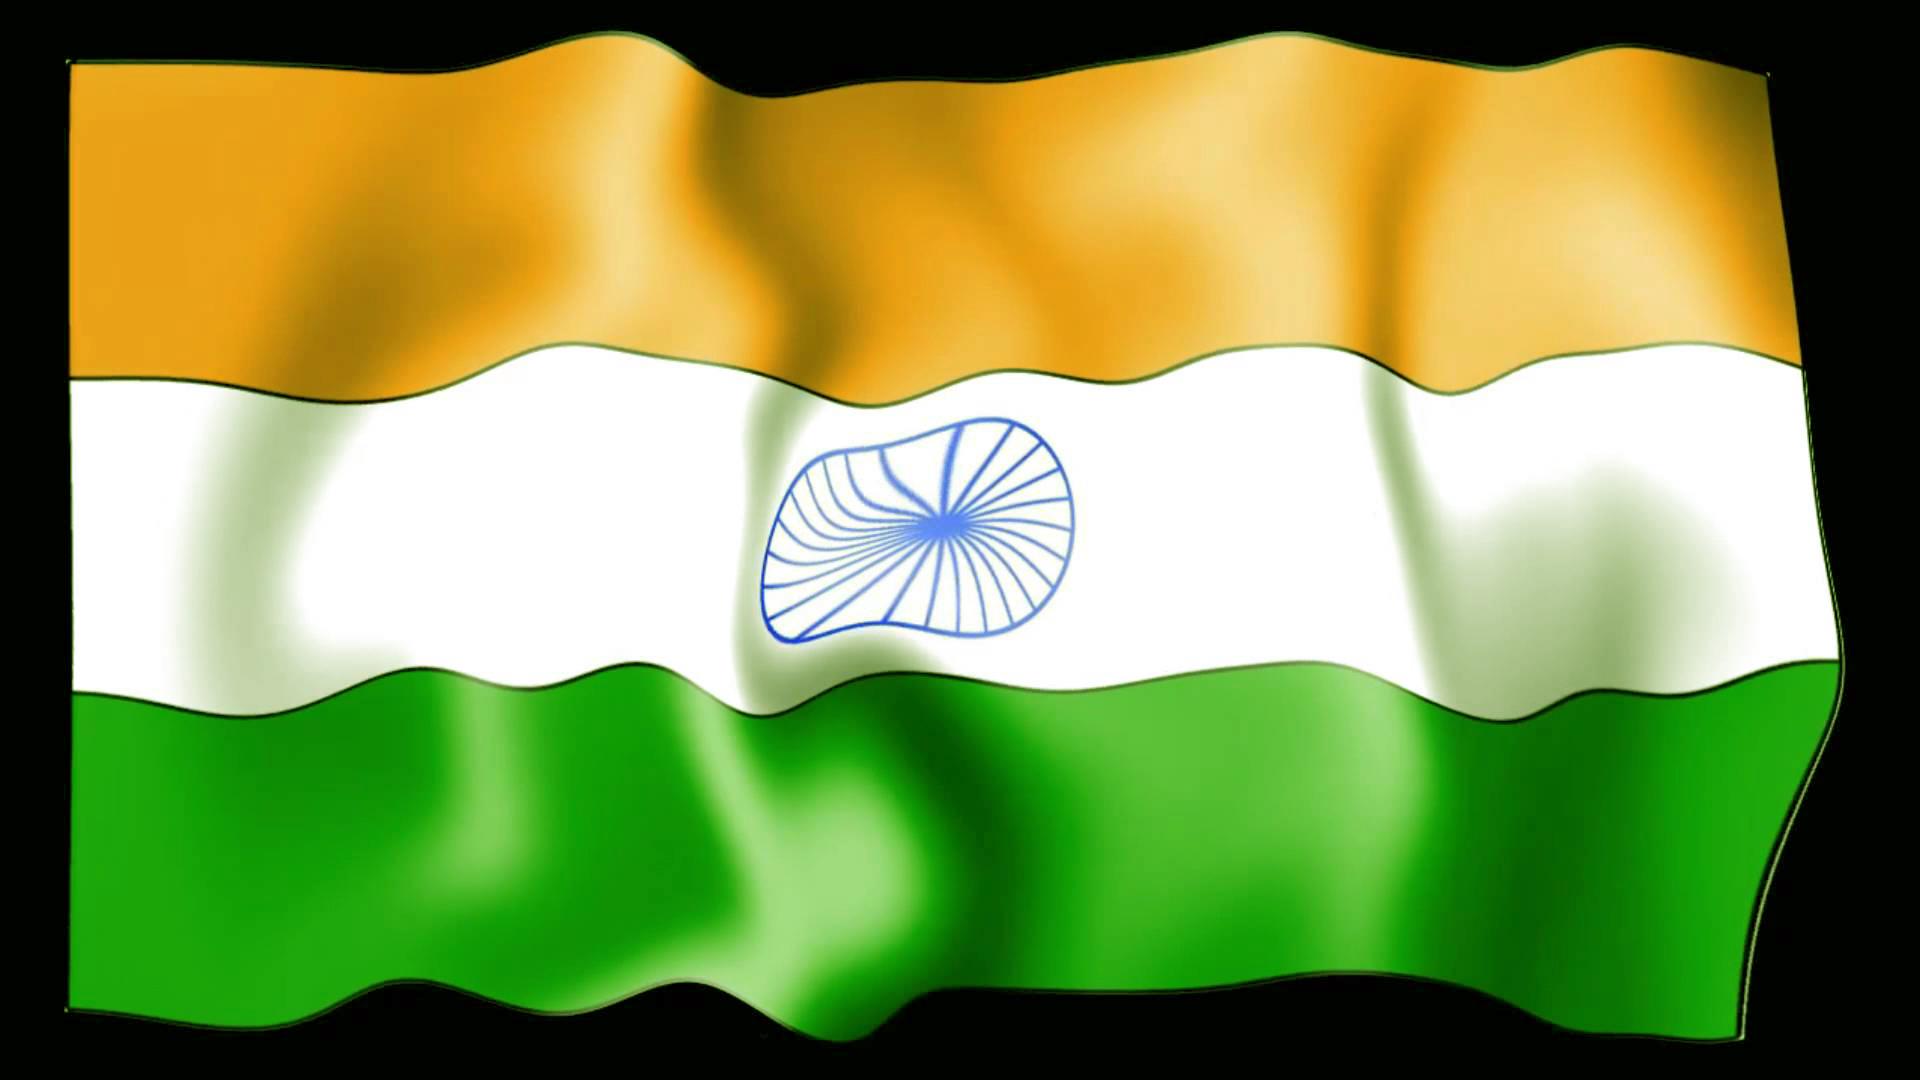 Indian Tiranga 3d Wallpaper New Indian Flag Hd Wallpapers Images 2015 Happy